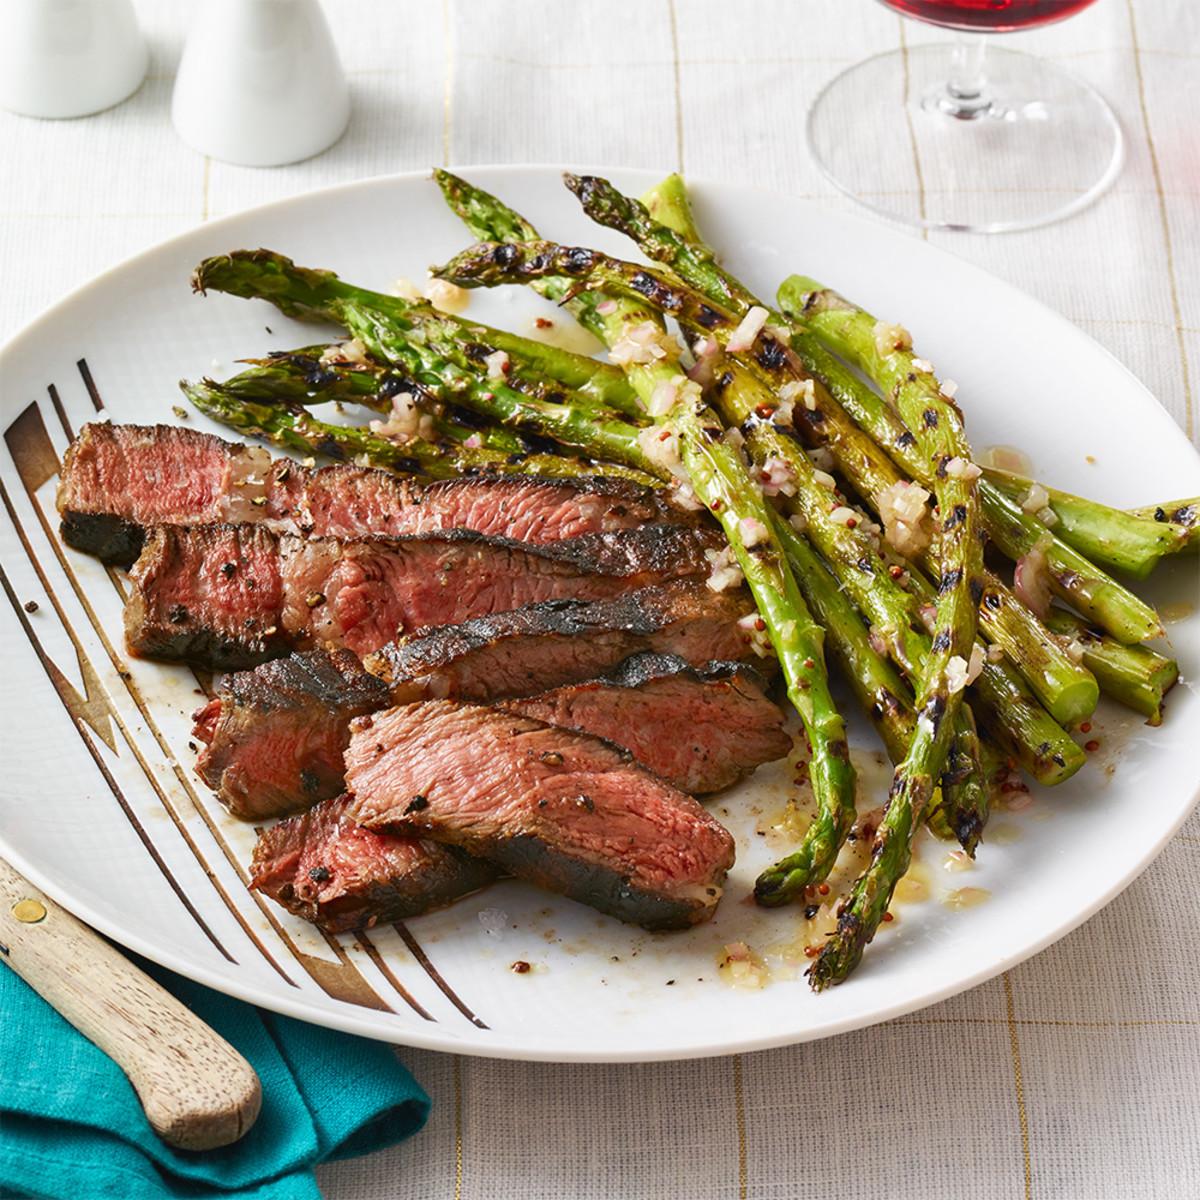 https://cdn.discordapp.com/attachments/456960544998686770/471384539554512907/grilled-steak-asparagus-with-stout-sauce-102718256.jpg